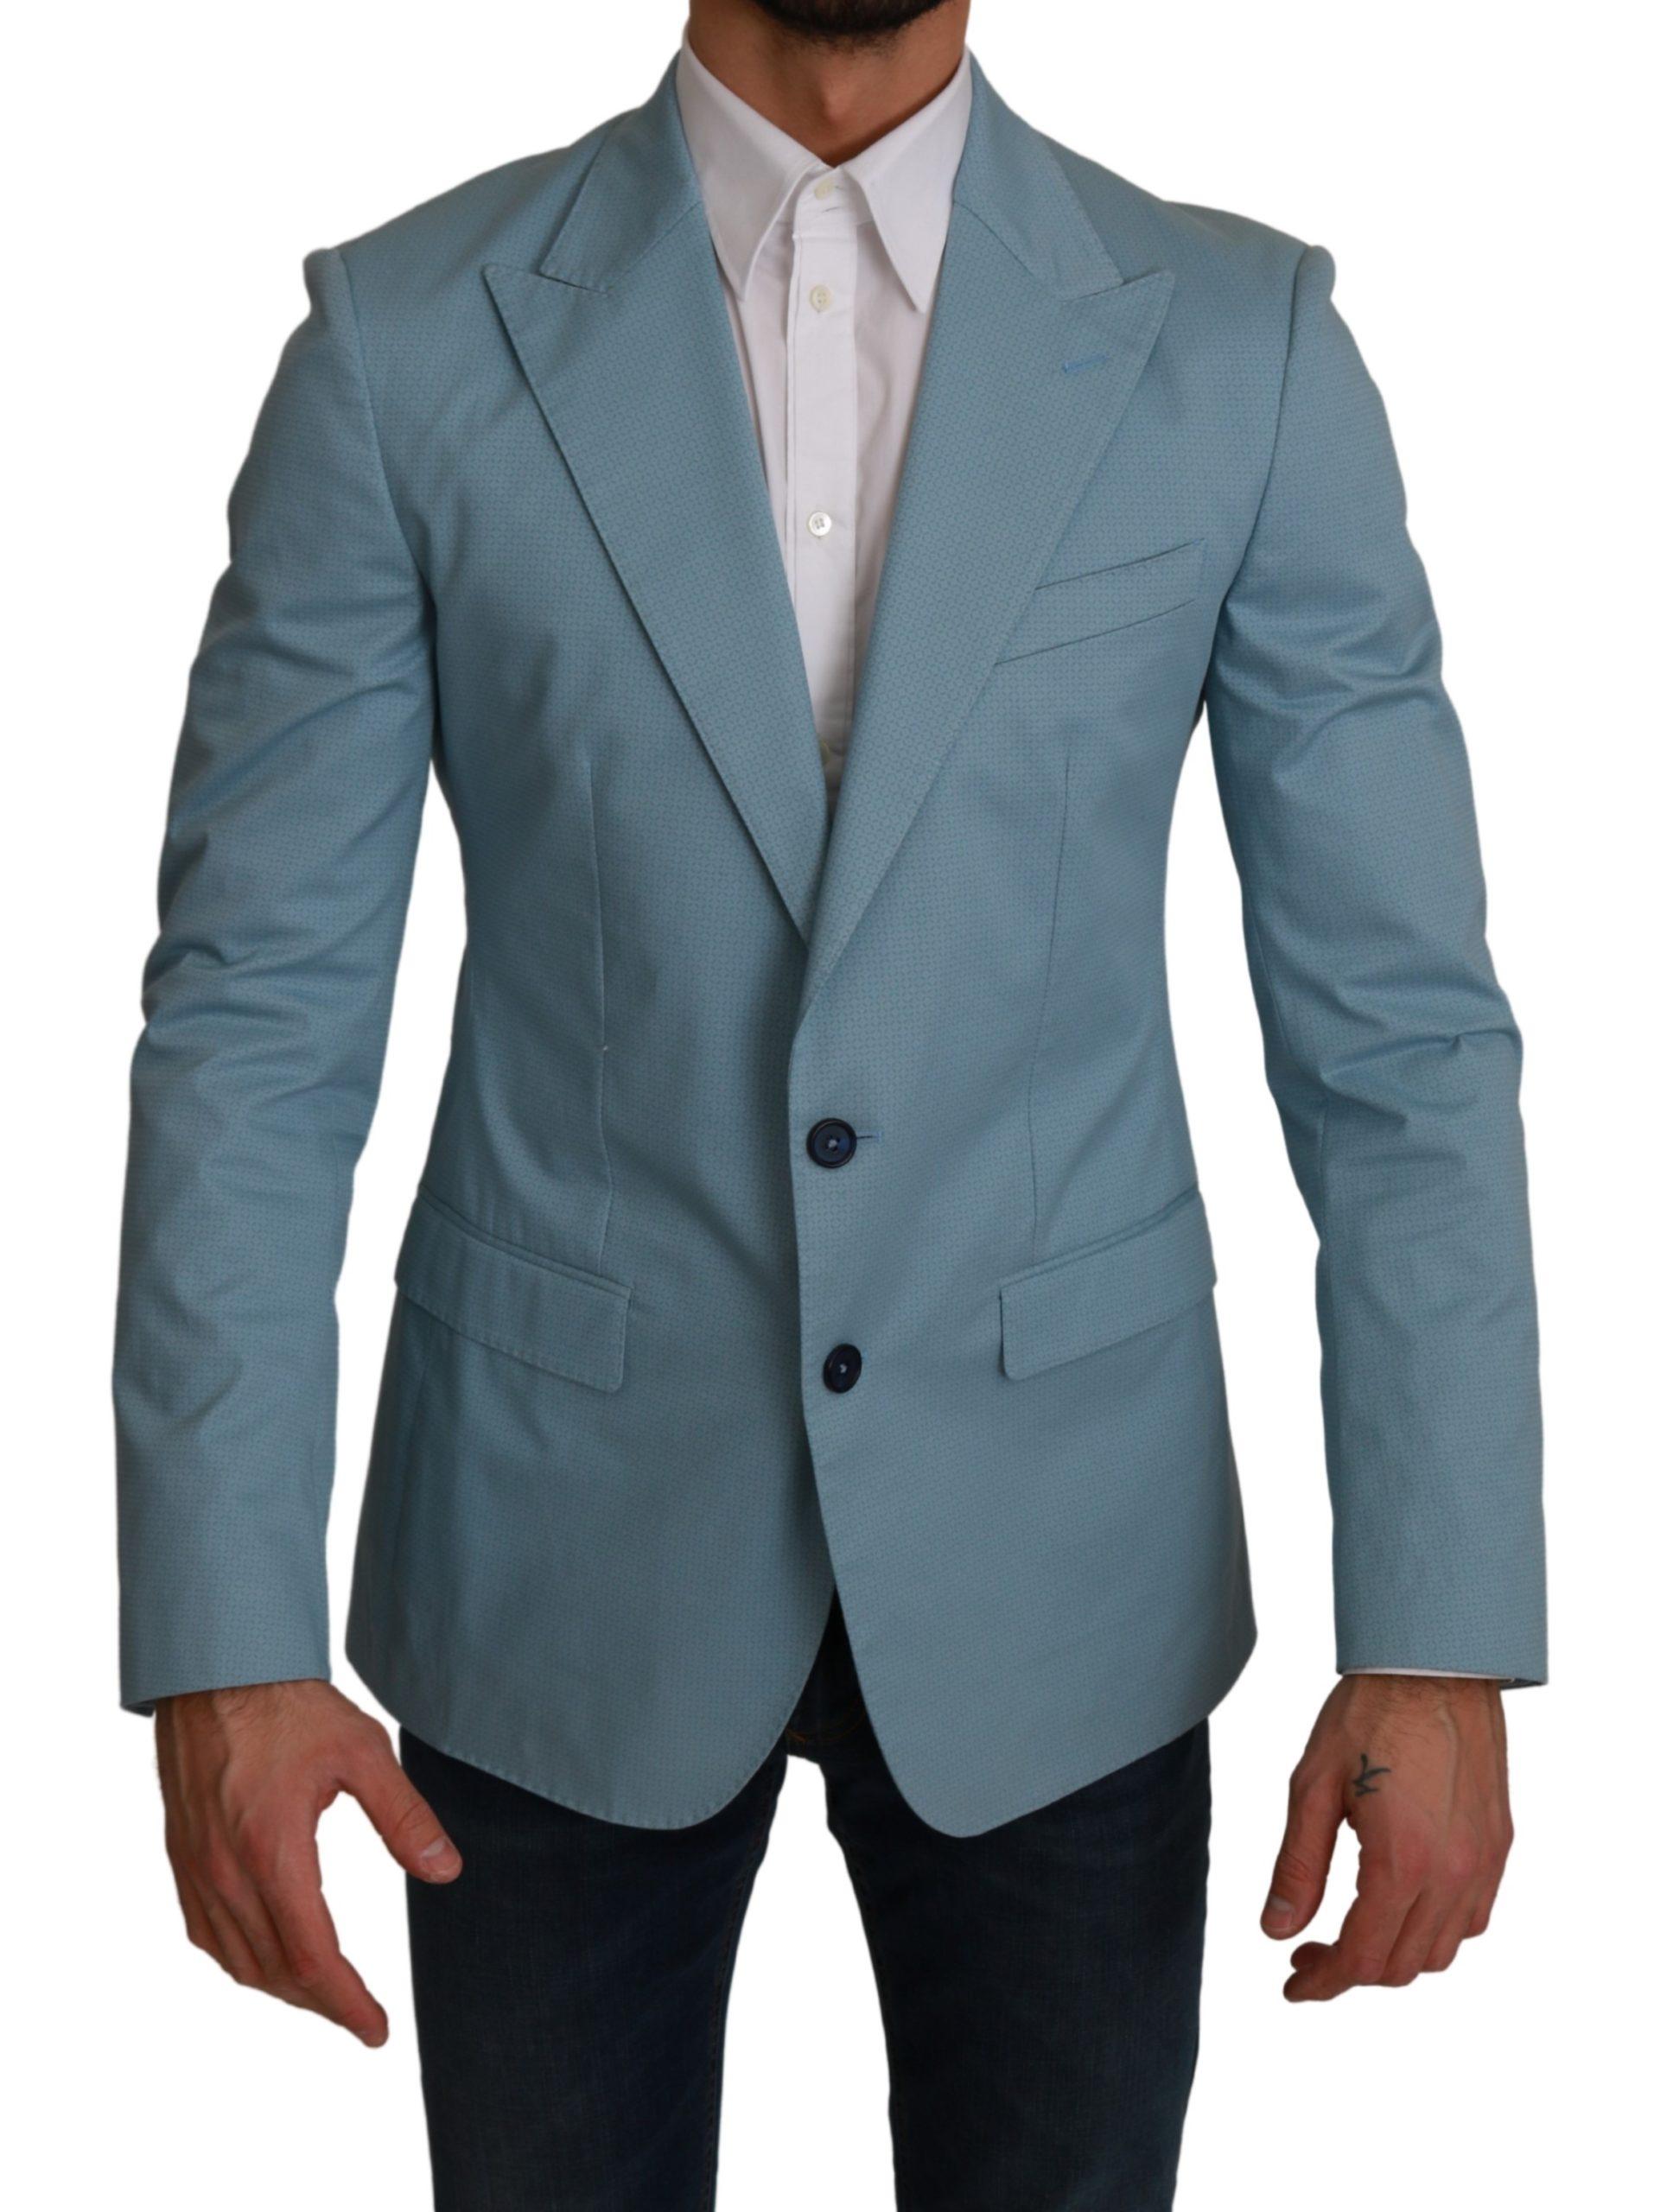 Dolce & Gabbana Men's Slim Fit Coat Jacket MARTINI Blazer Blue KOS1736 - IT48 | M